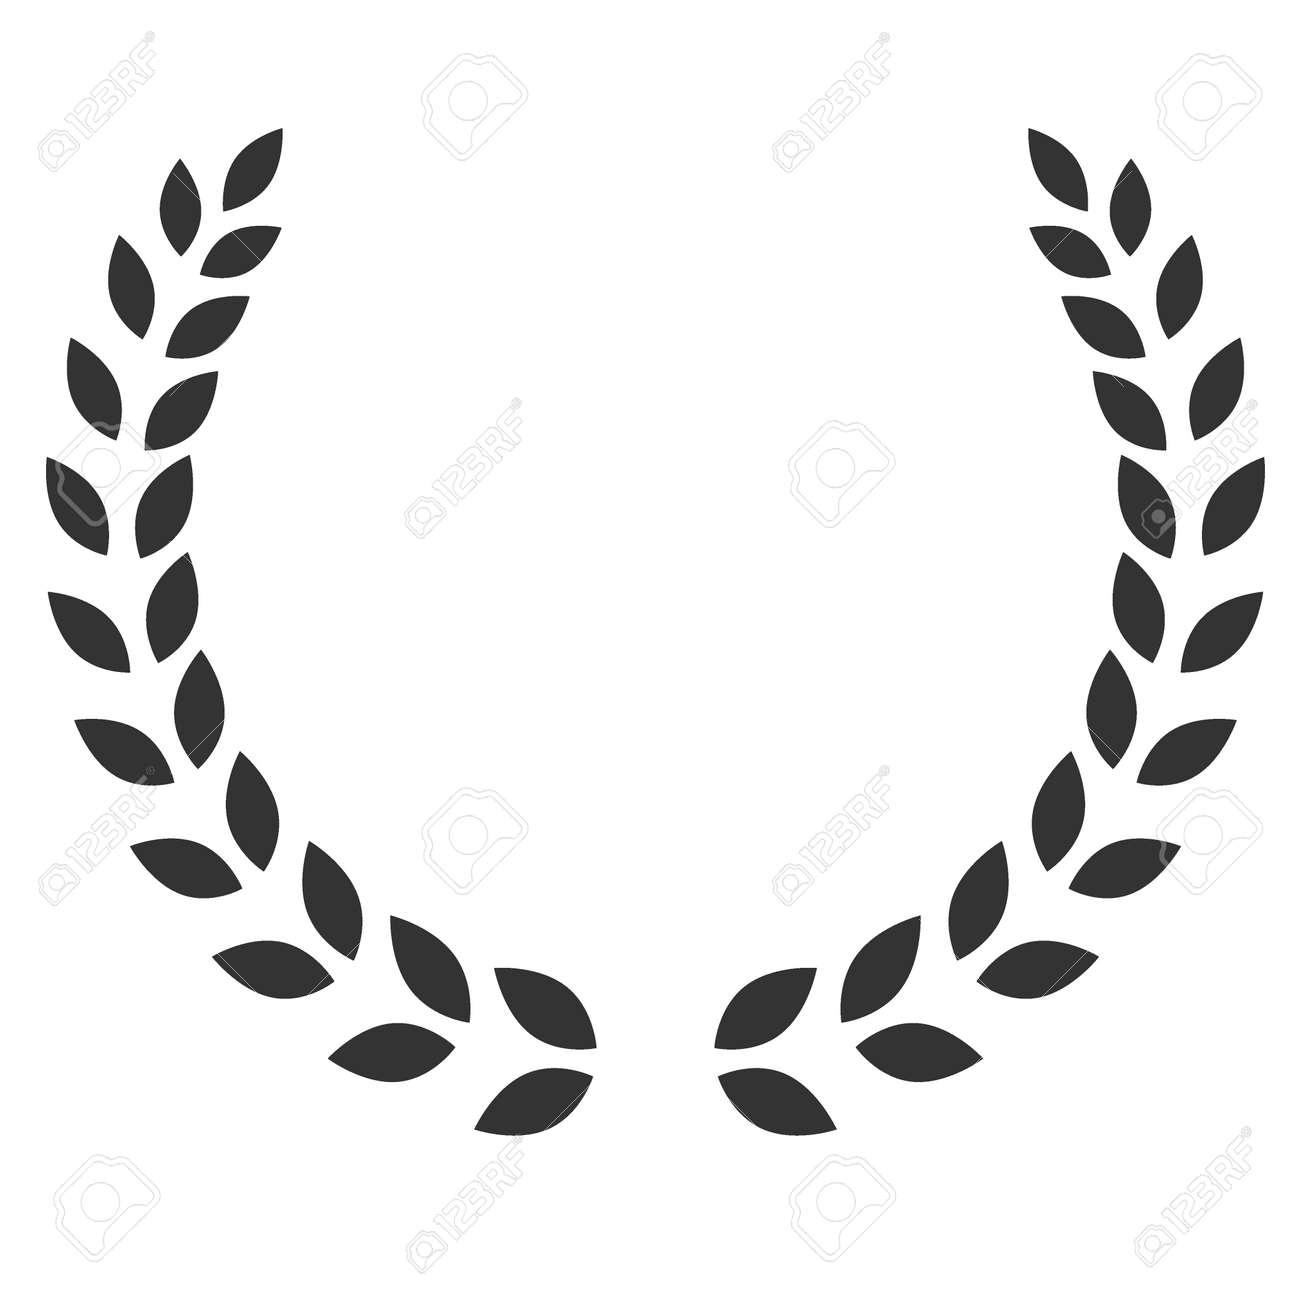 A Laurel Wreath Symbol Of Victory And Achievement Design Element